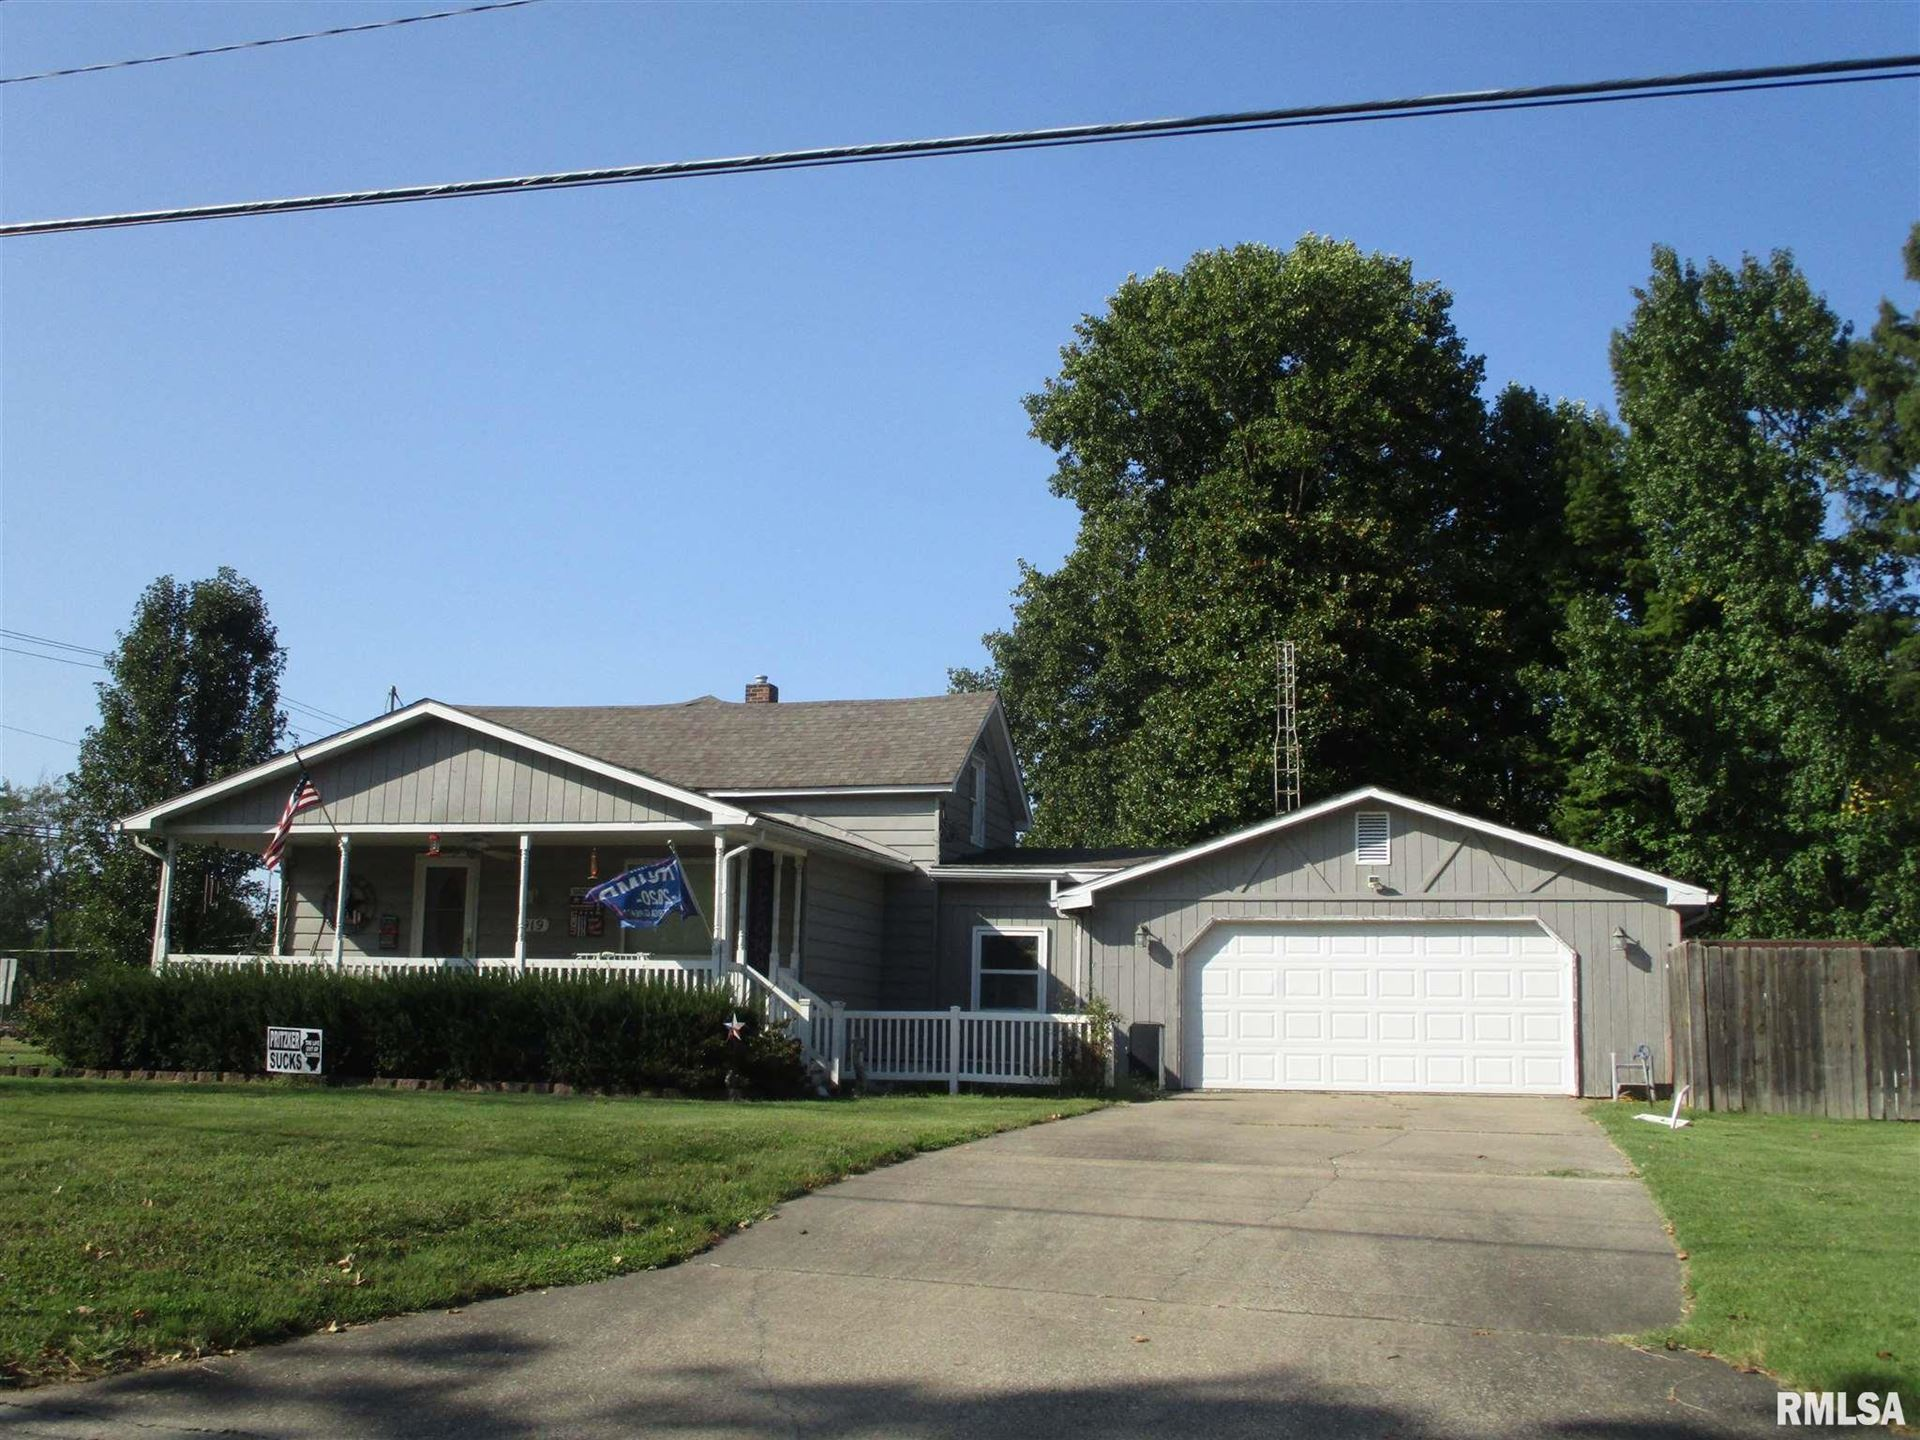 919 W WEBSTER, Benton, IL 62812-000 - MLS#: EB438090